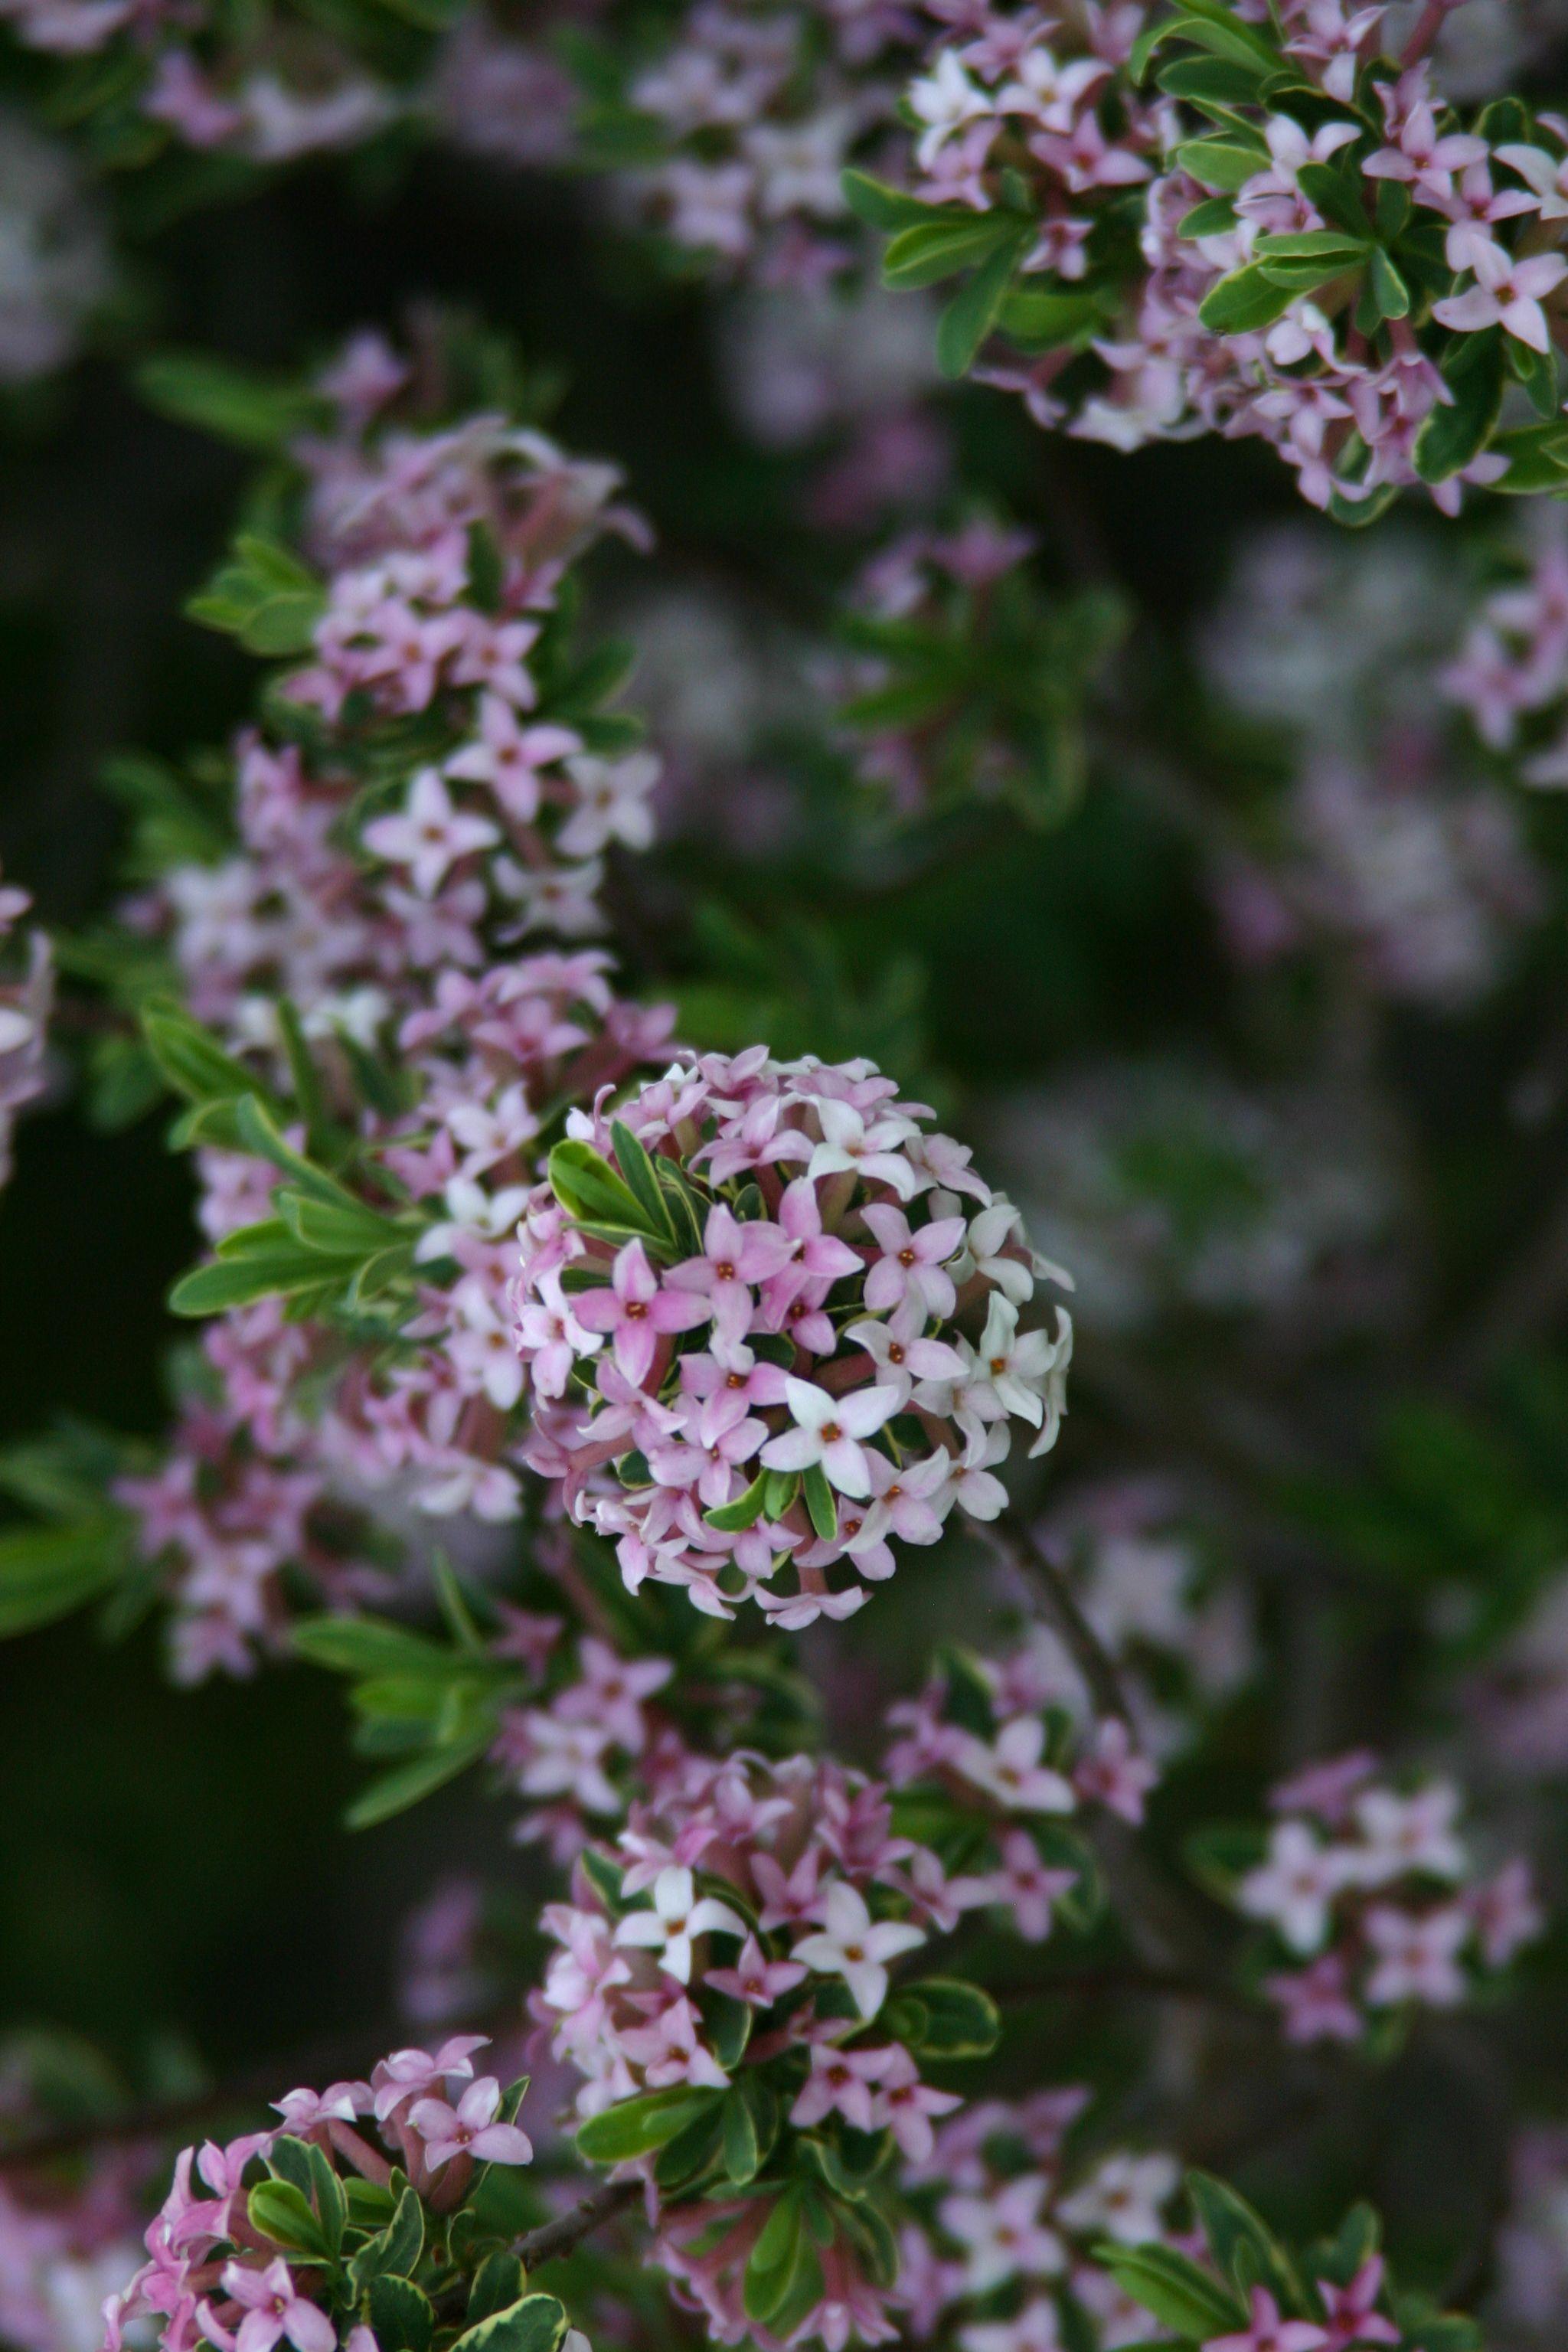 Carol Mackie daphne Daphne x burkwoodii e of the best smelling flowers